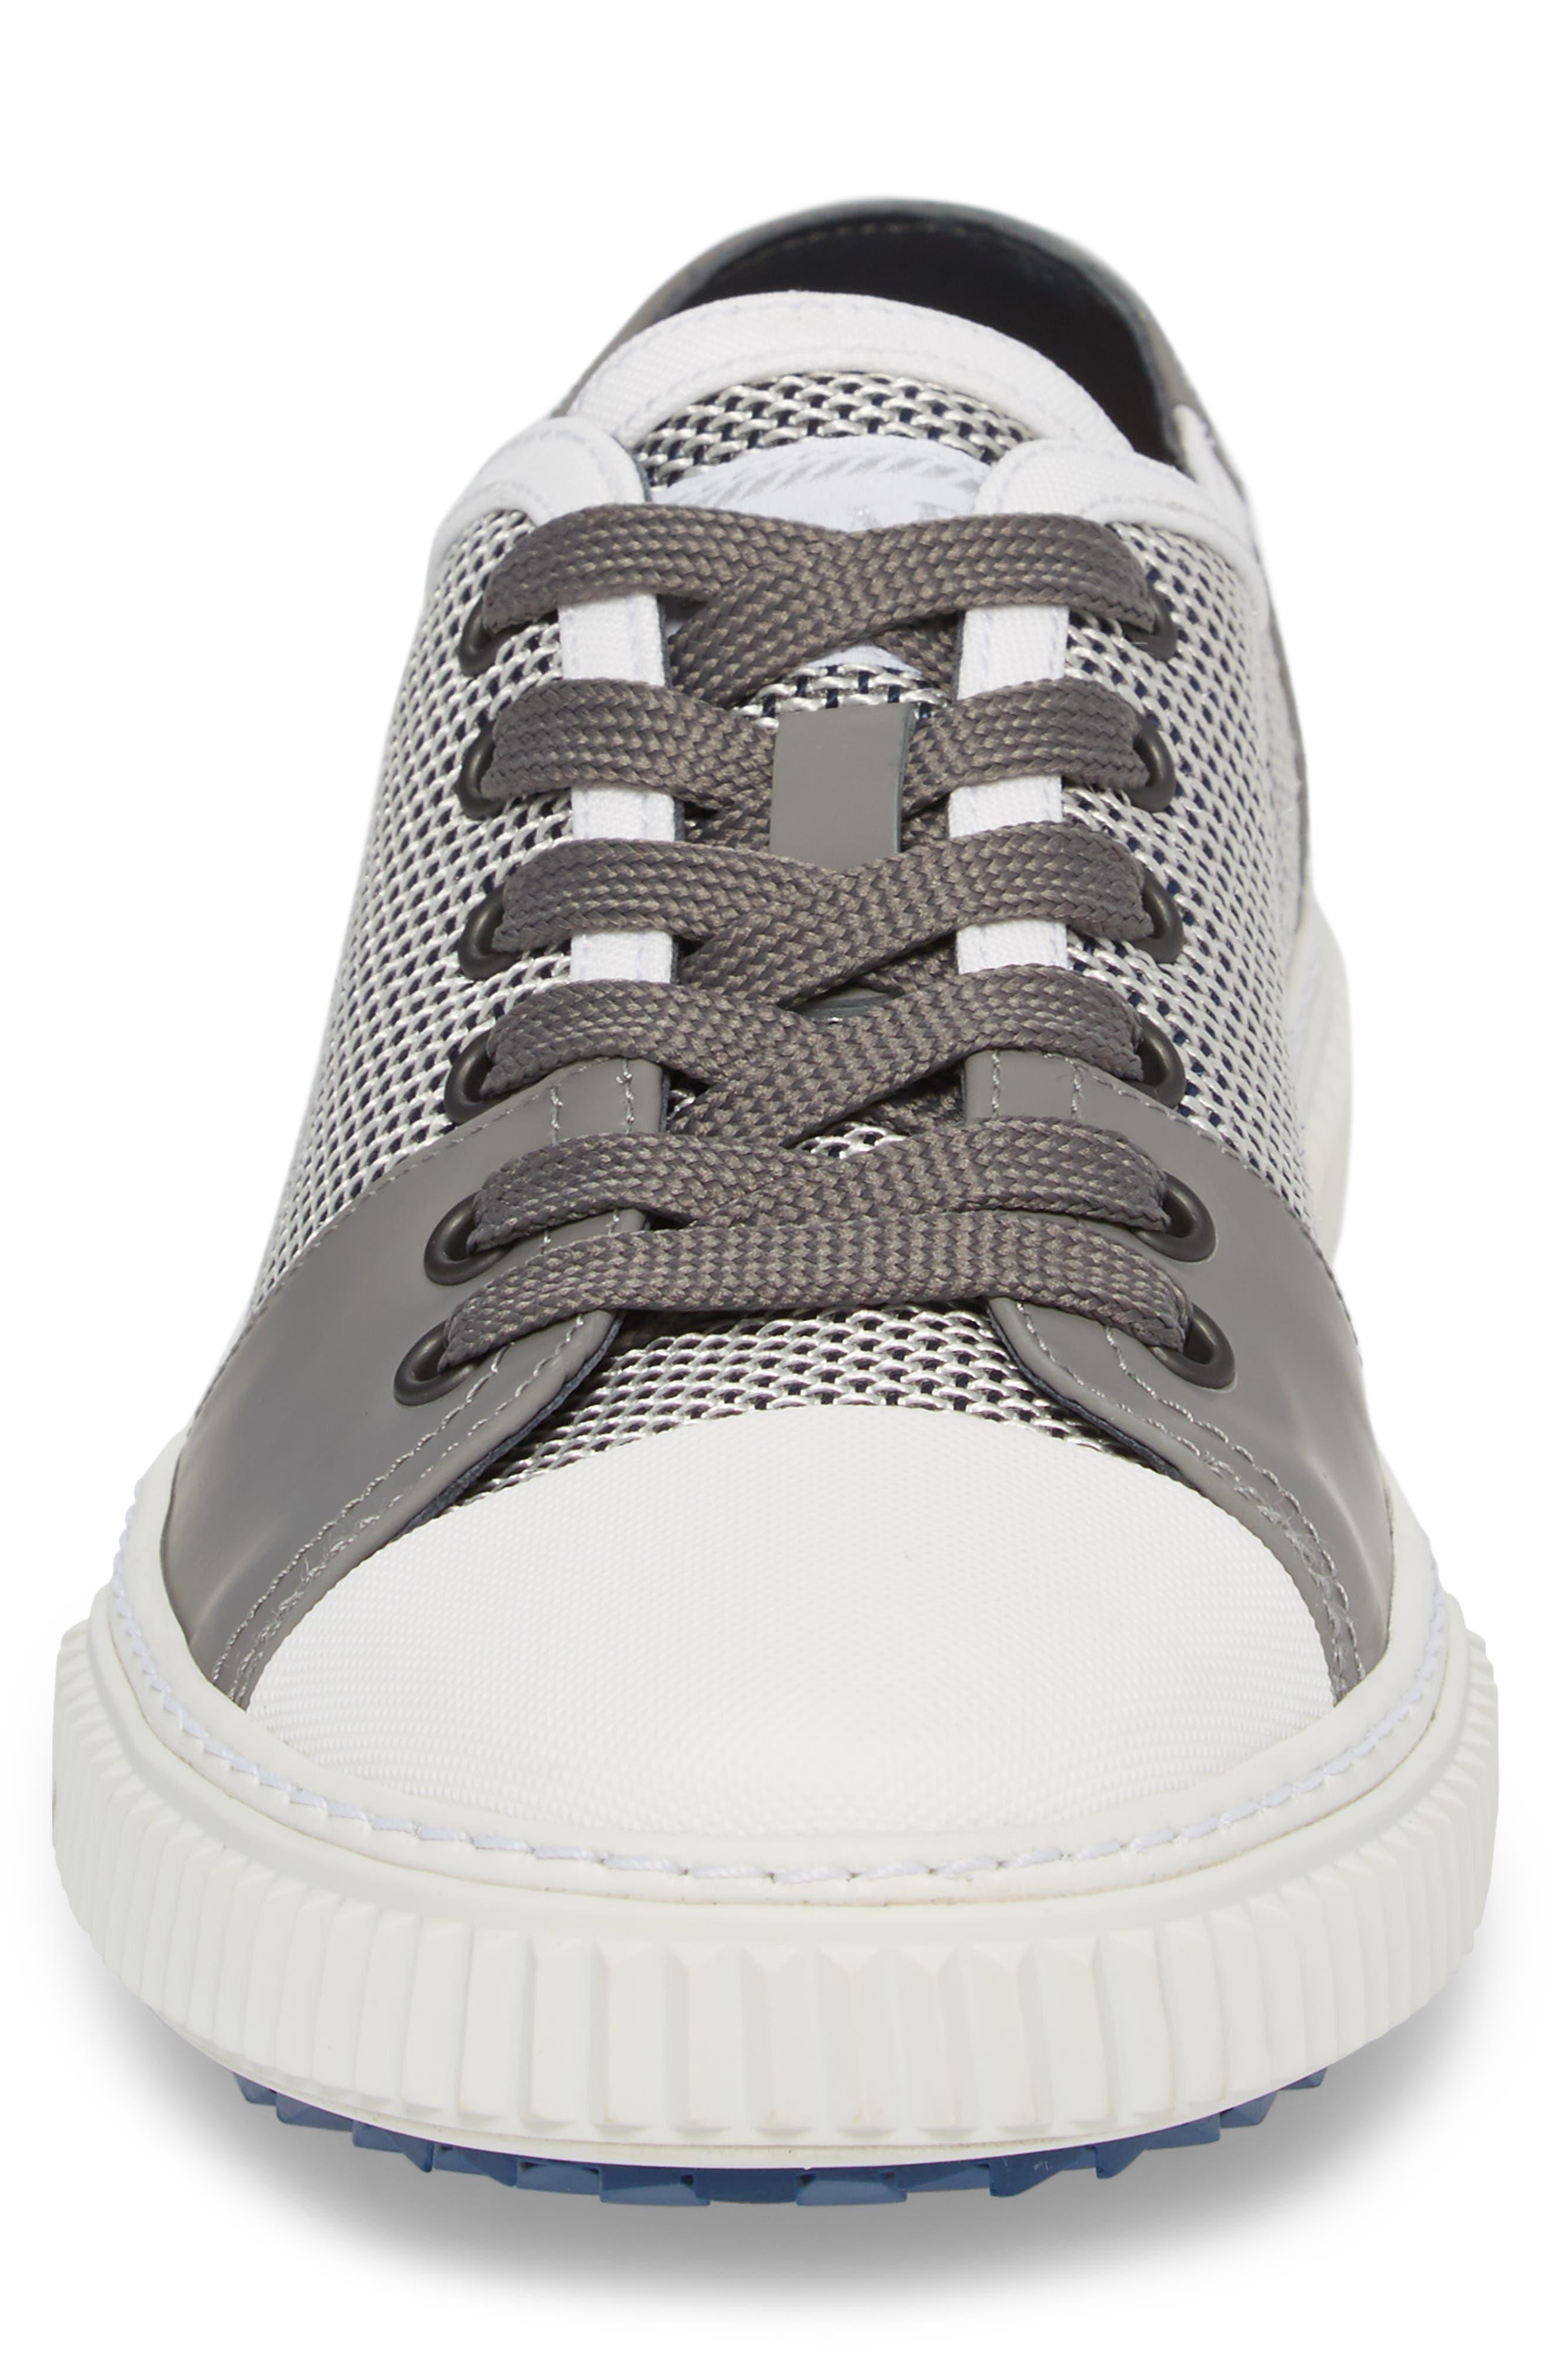 Linea Rossa Low-Top Sneaker,                             Alternate thumbnail 4, color,                             Baltic White